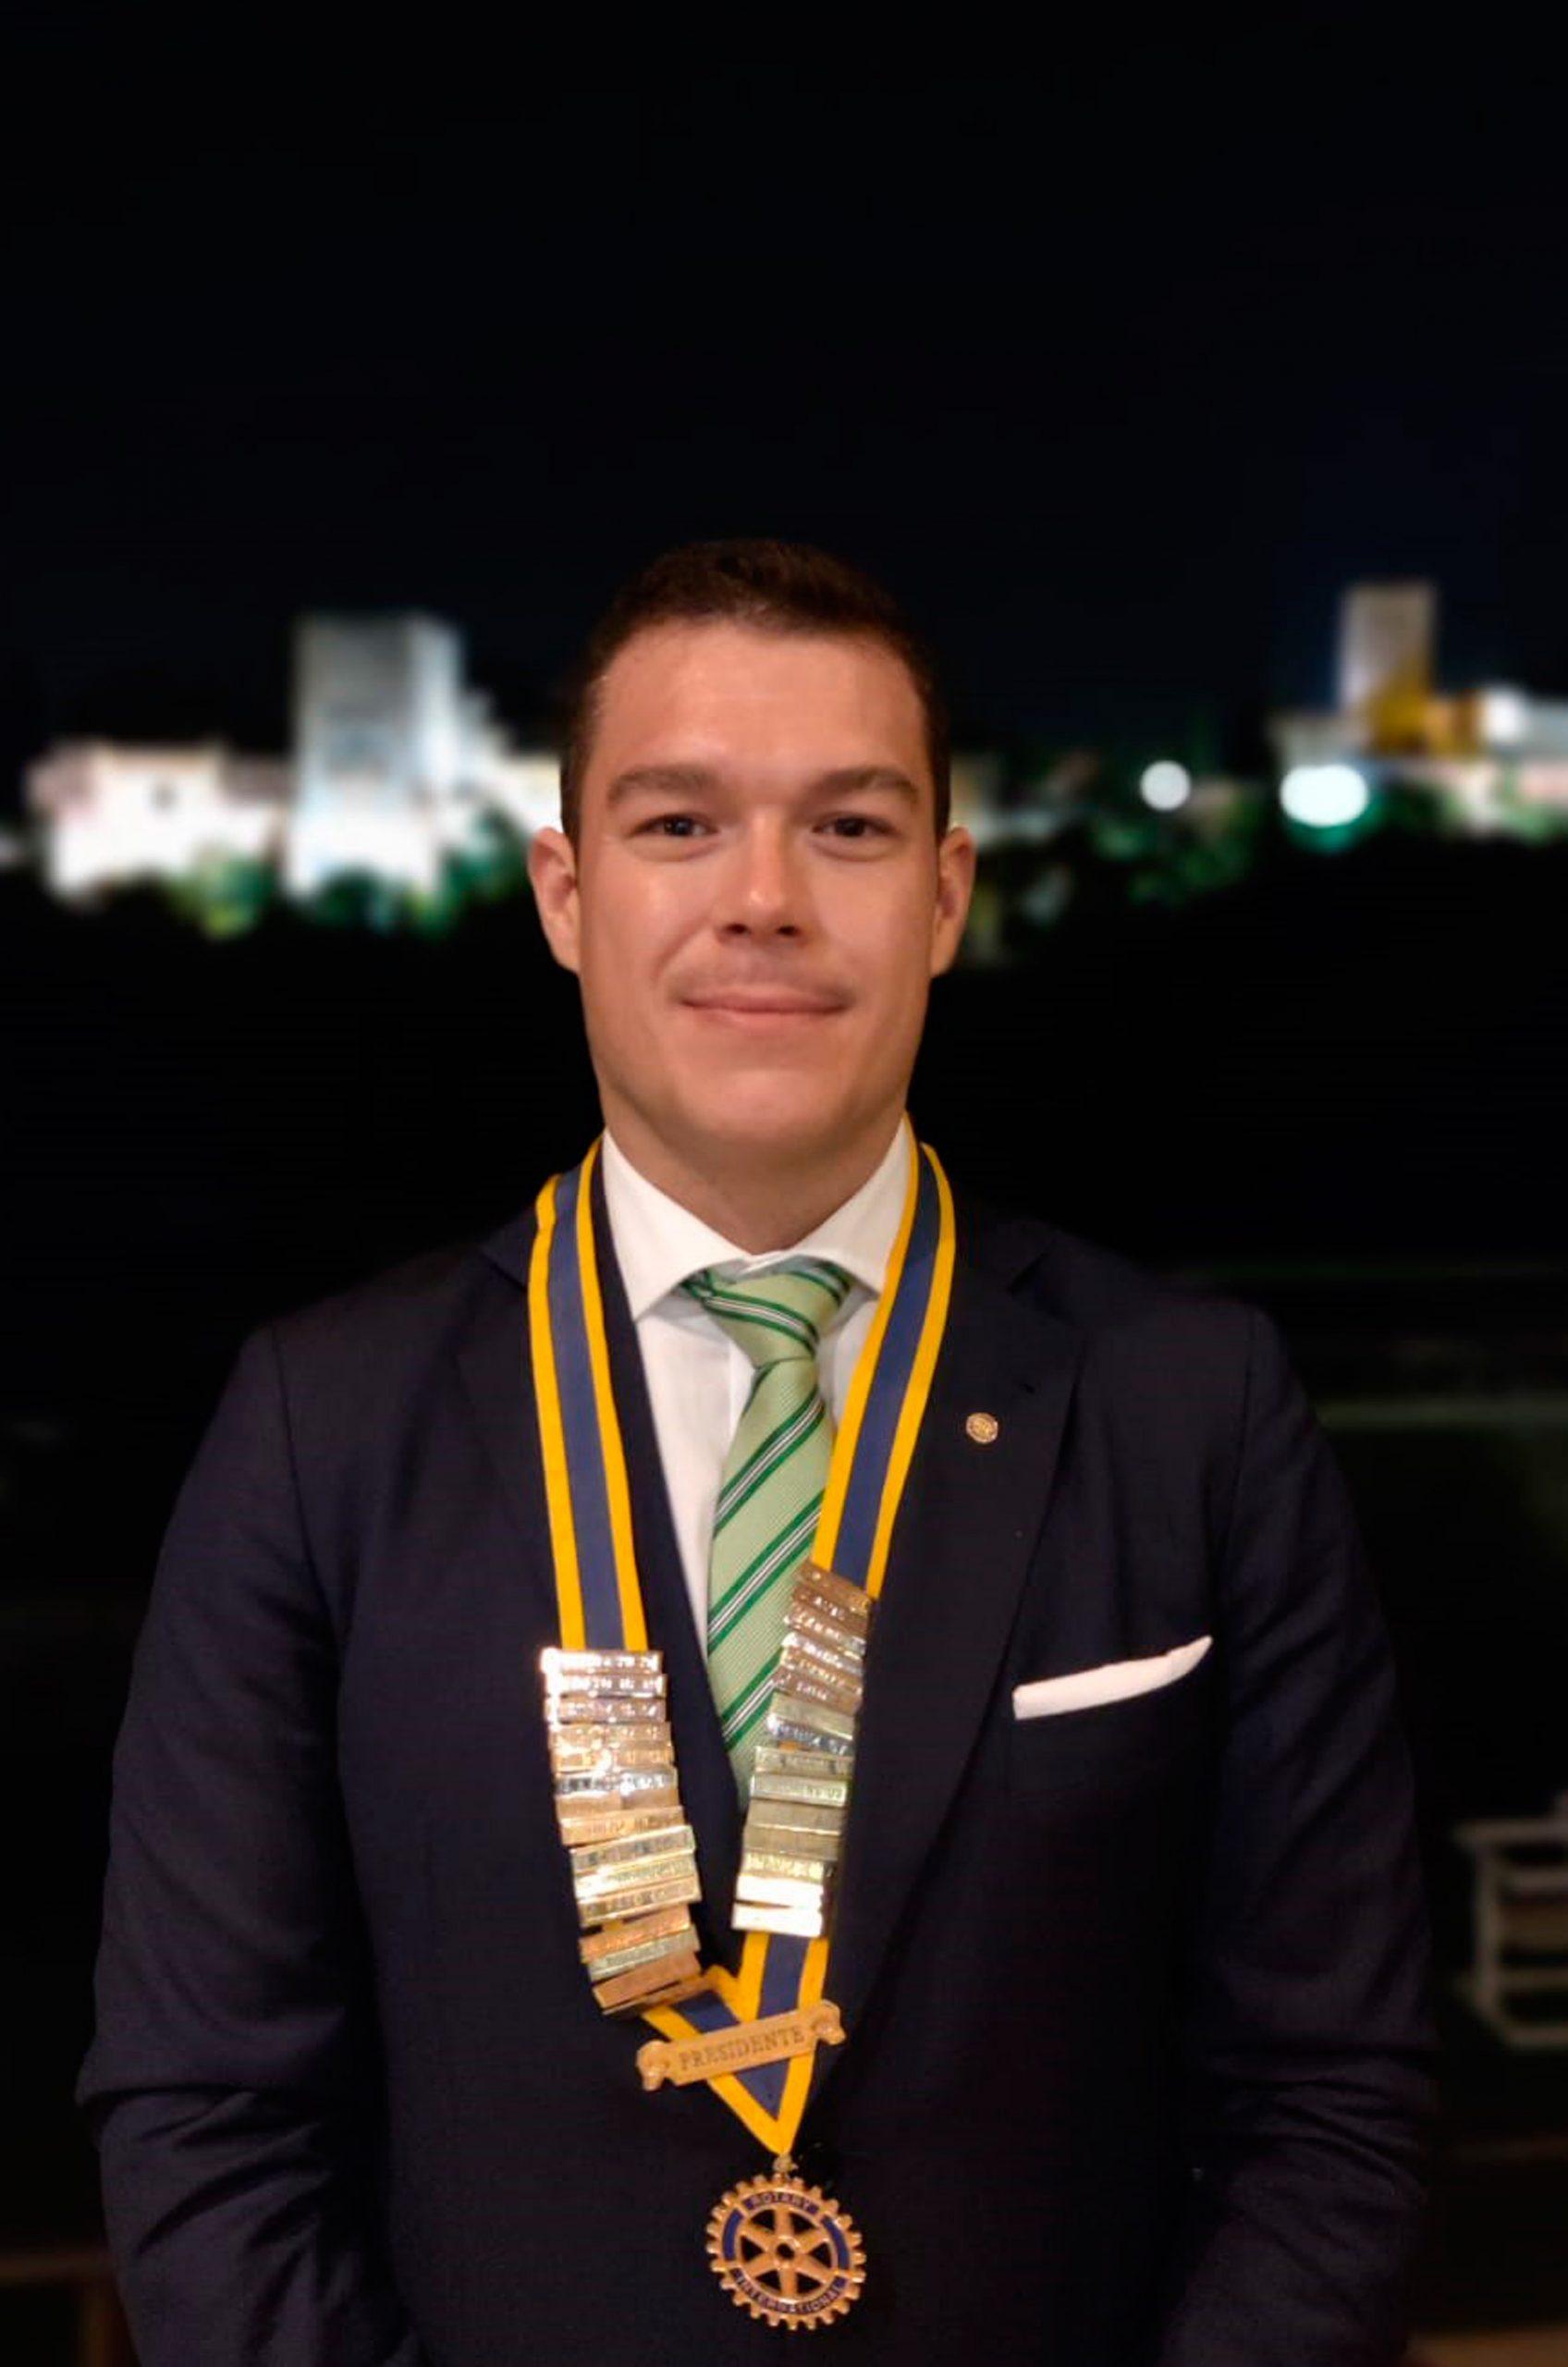 Javier Bocanegra Baquero